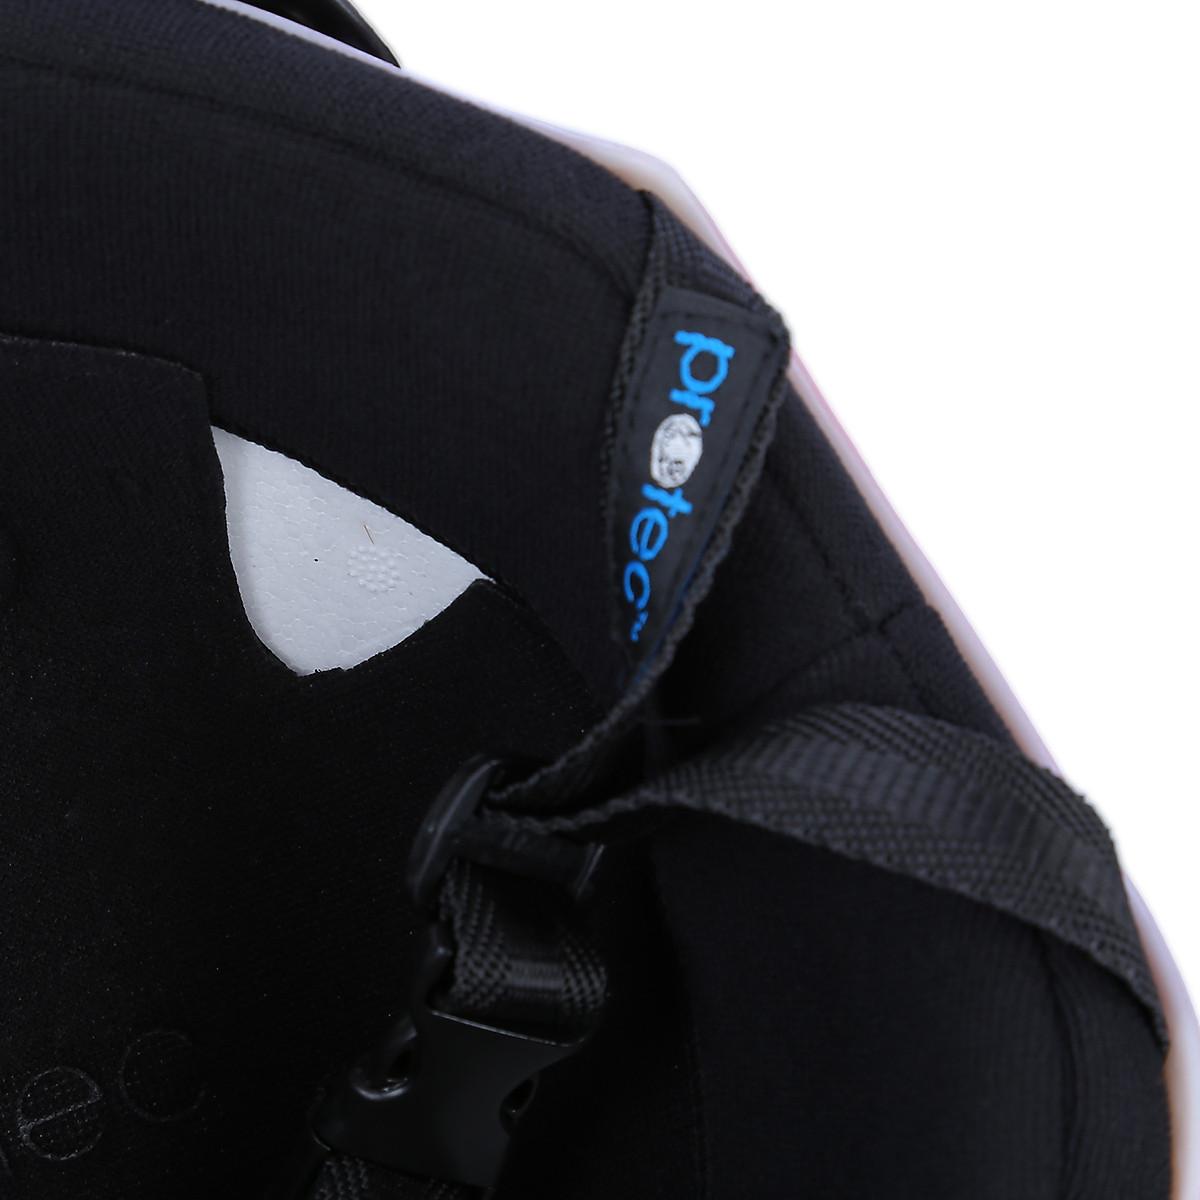 Mũ Bảo Hiểm 1/2 Đầu Protec Kitty KMW (Size M)=199.000 ₫